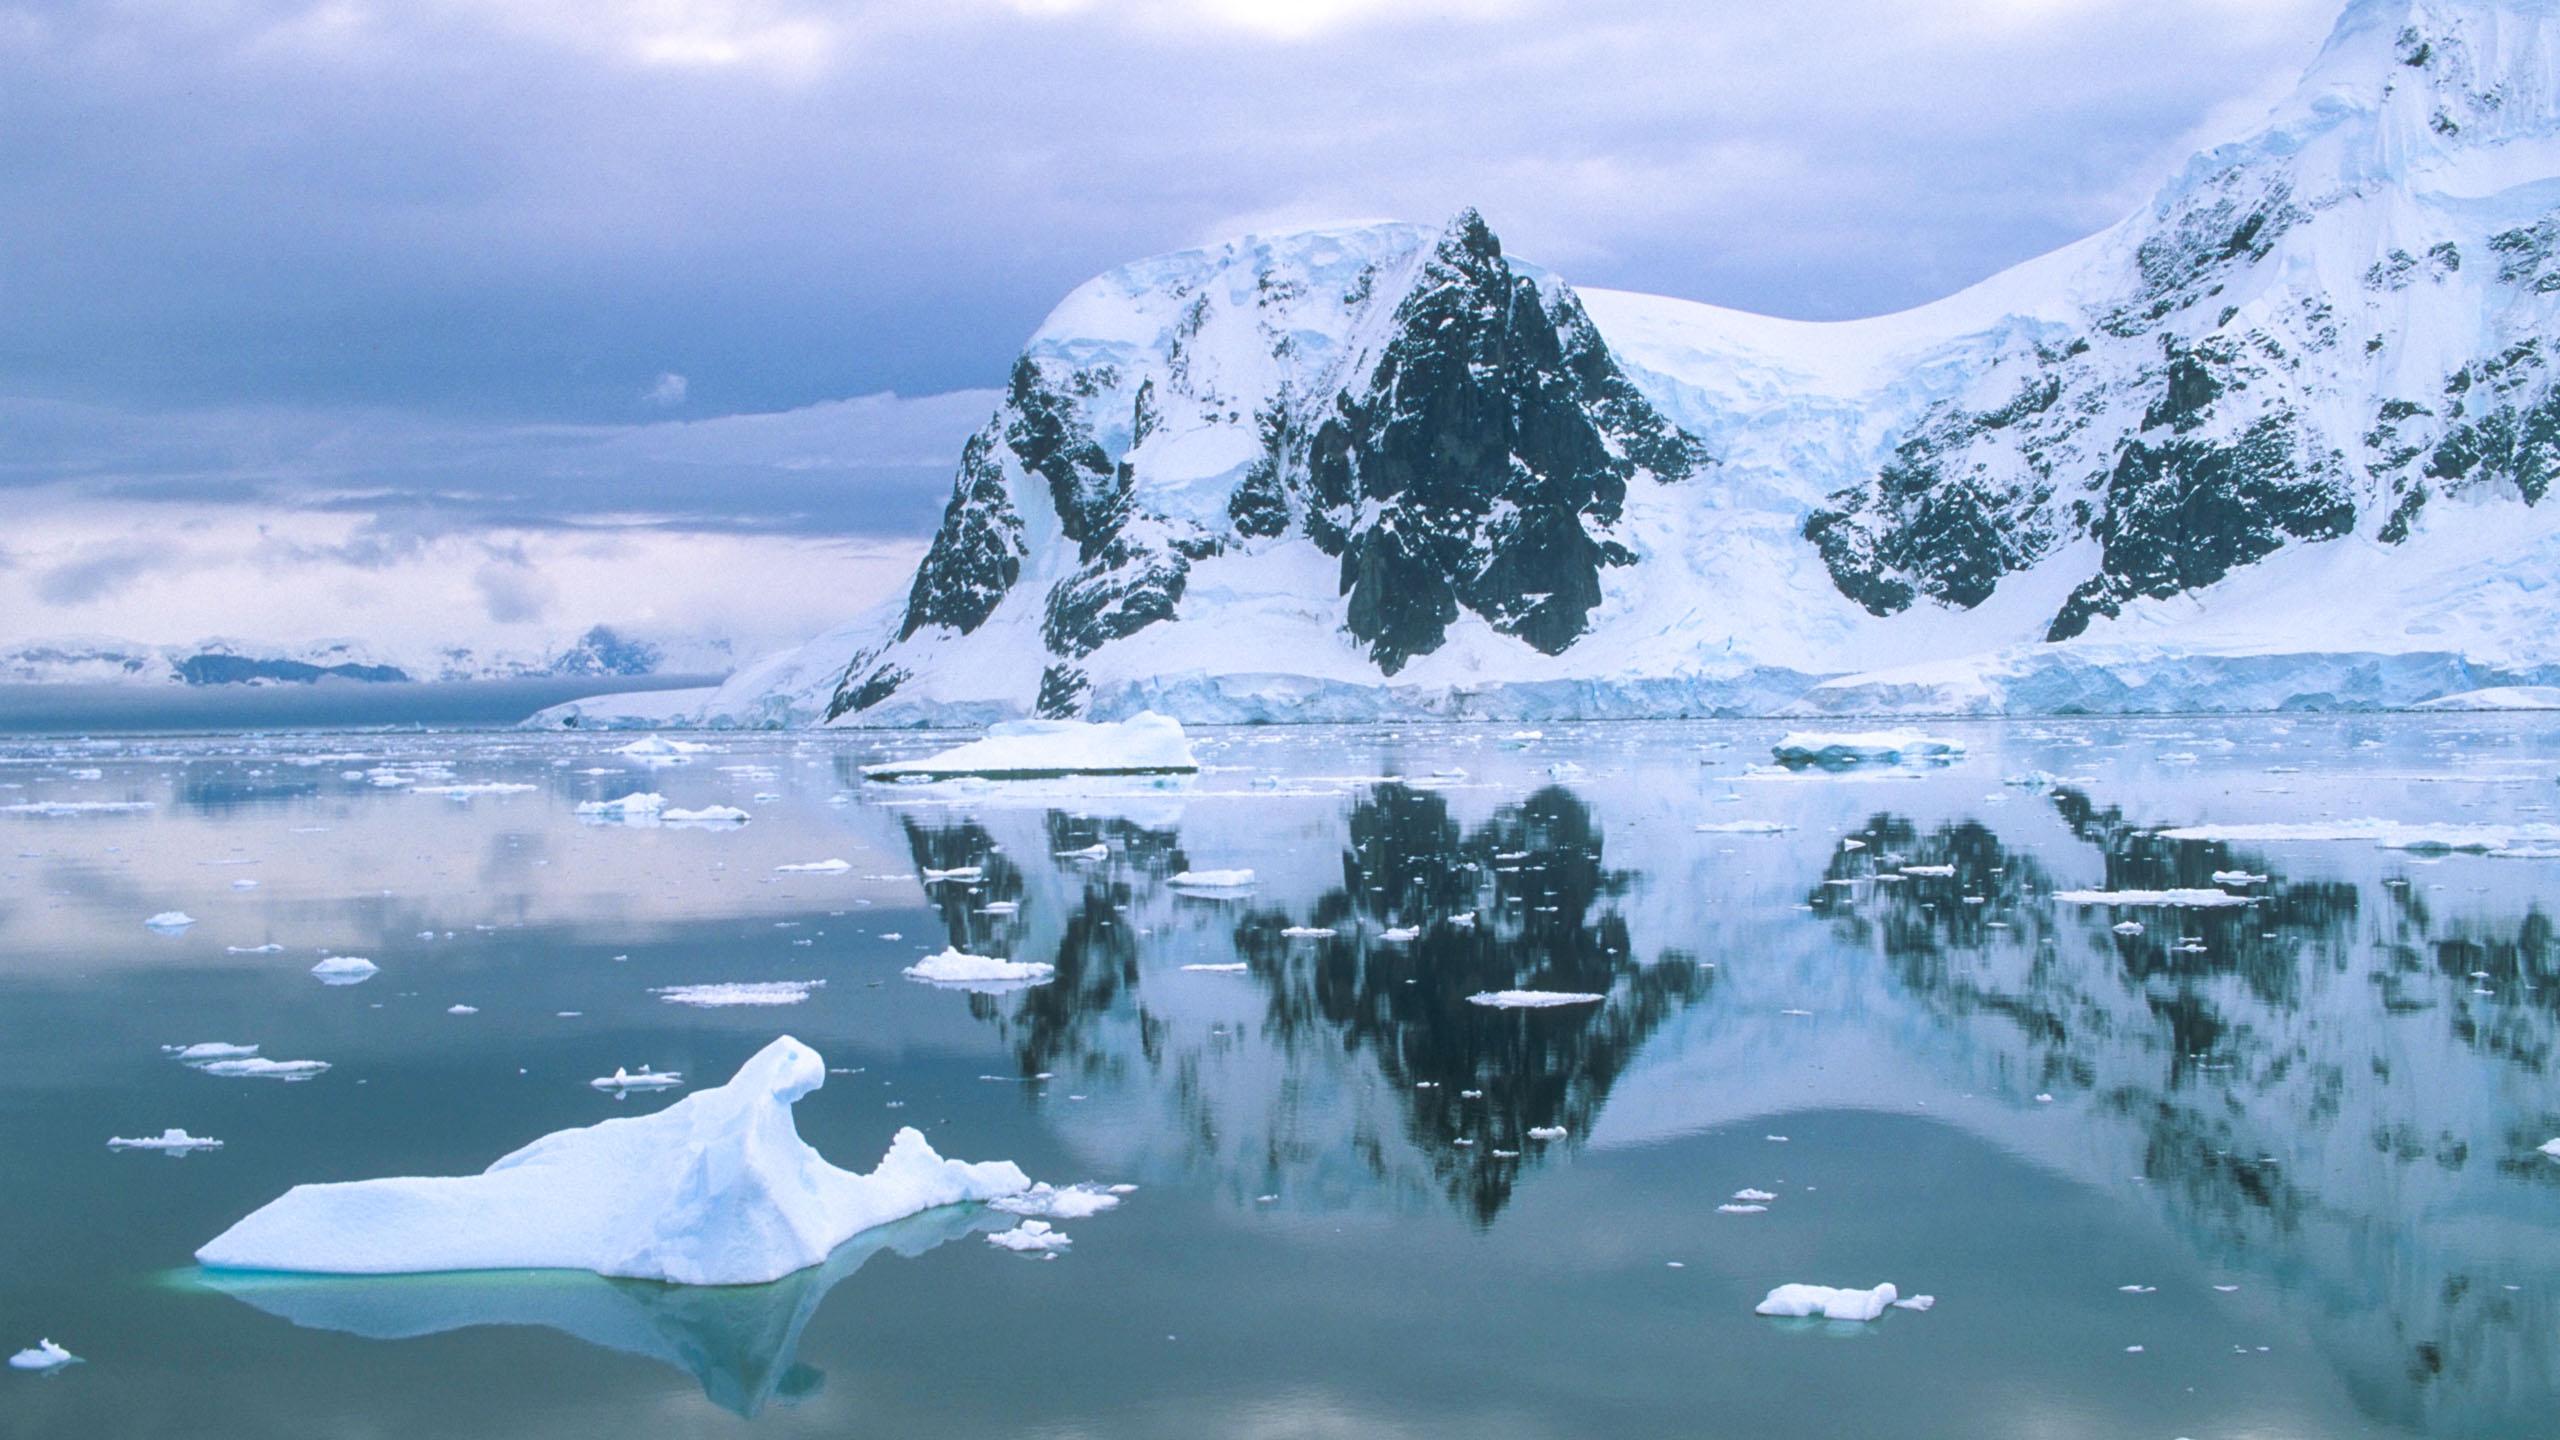 Antarctica landscape and ocean view